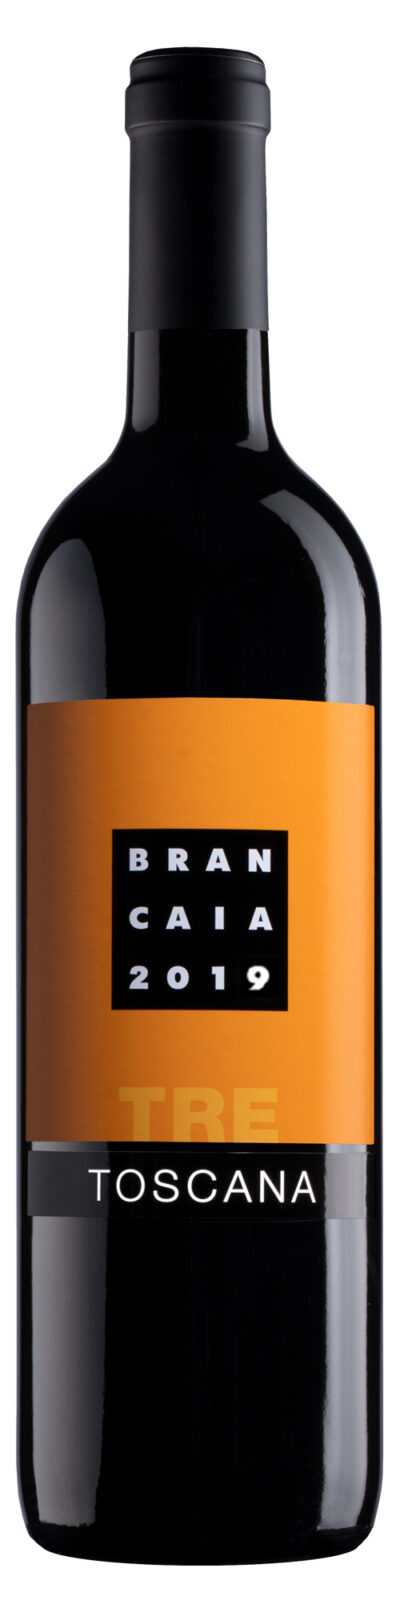 Brancaia TRE 2019